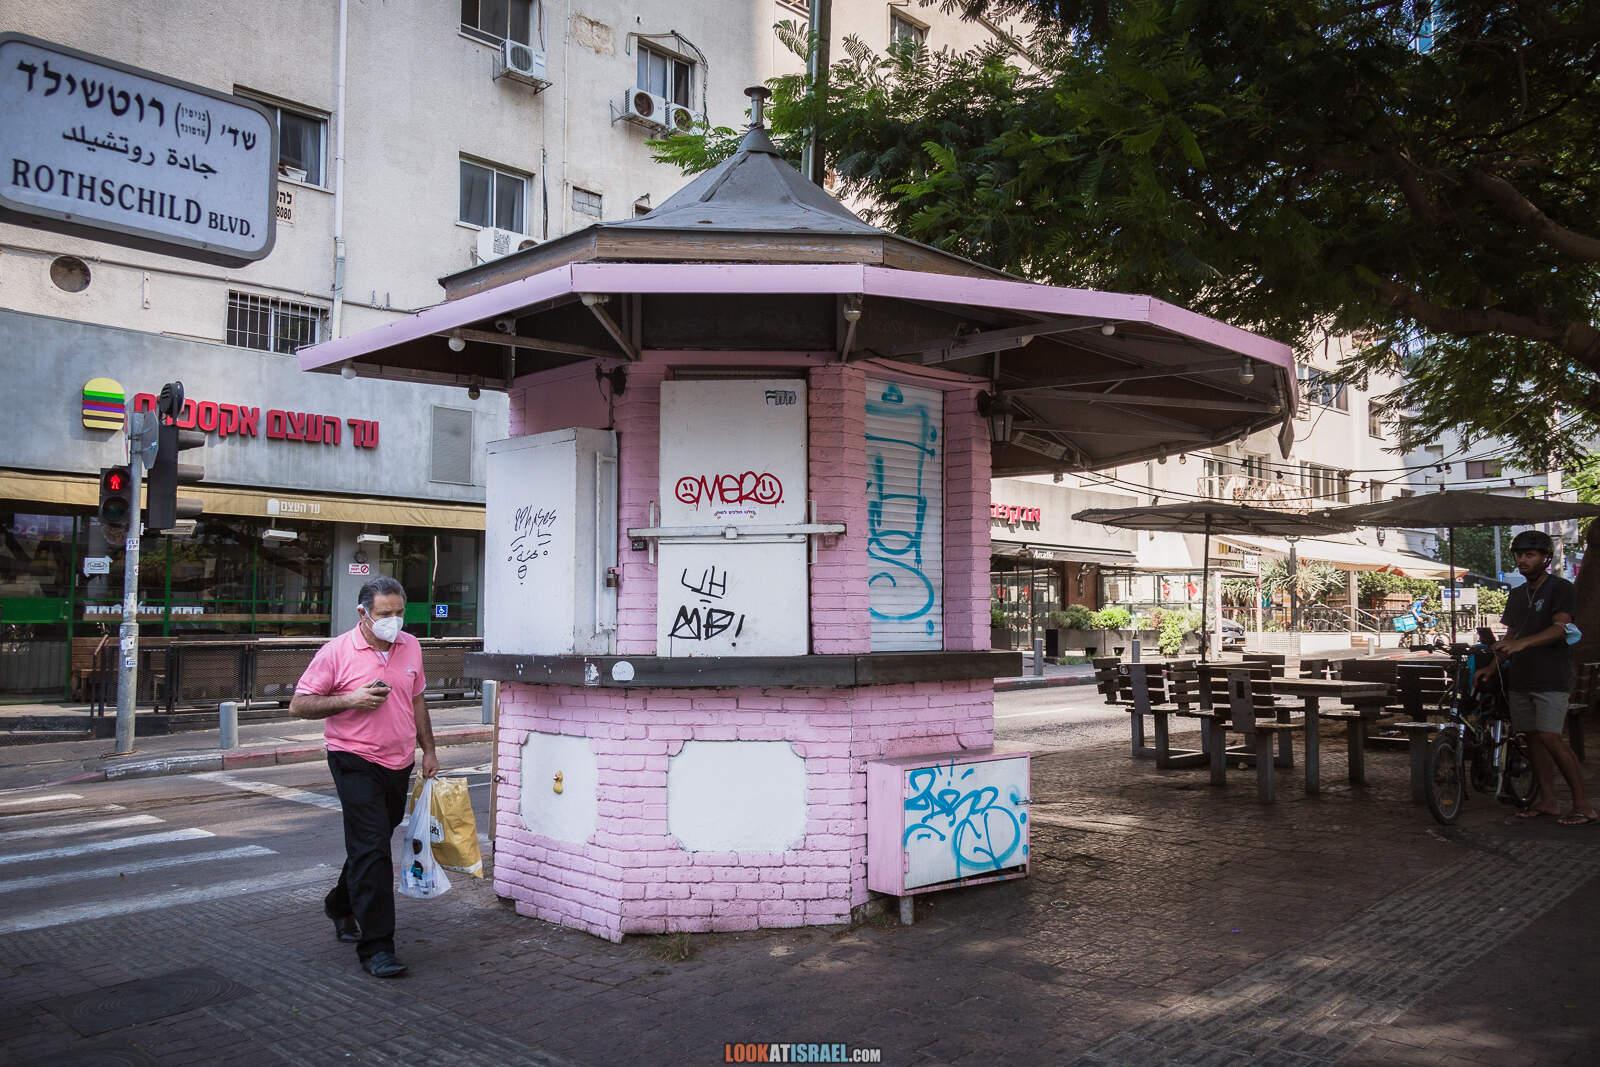 Тель-Авив, бульвар Ротшильд и театр Габими во время карантина